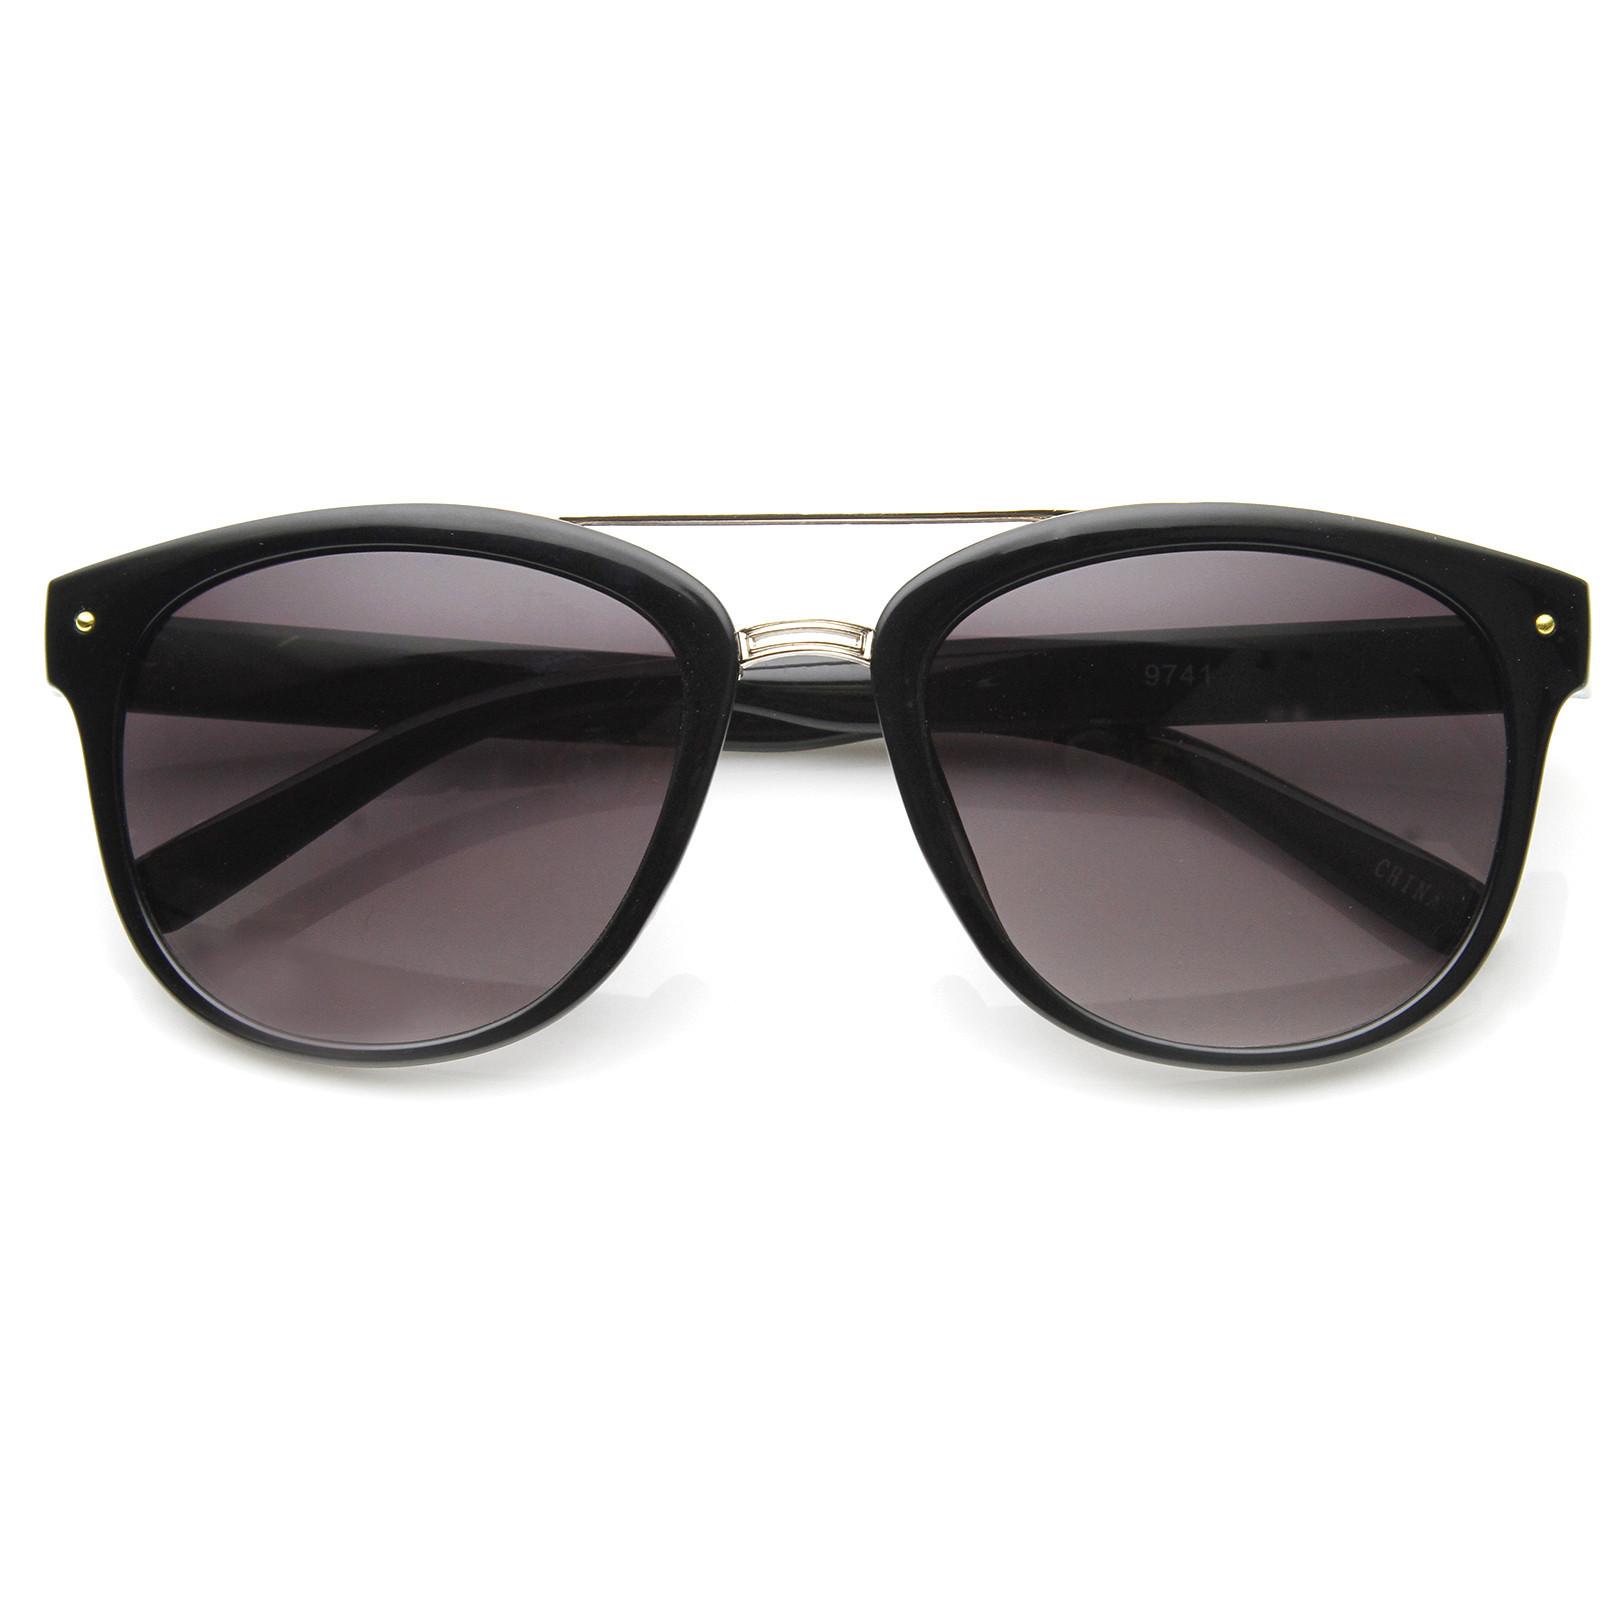 Dapper GQ Mens Crossbar Square Aviator Fashion Sunglasses 8962